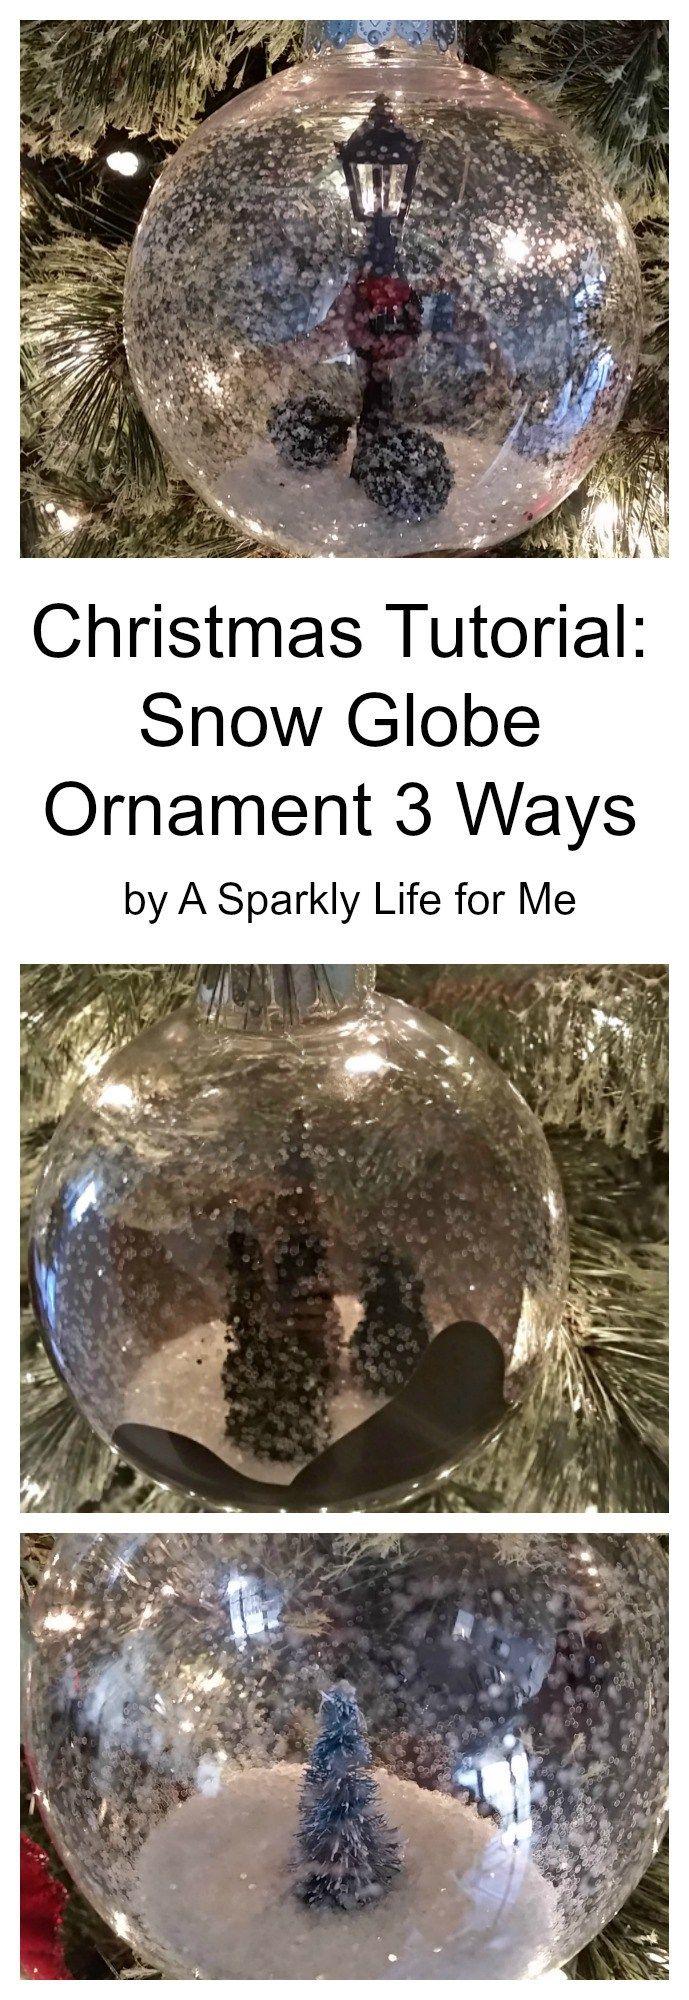 Christmas Tutorial Snow Globe Ornament 3 Ways {Video Tutorial}